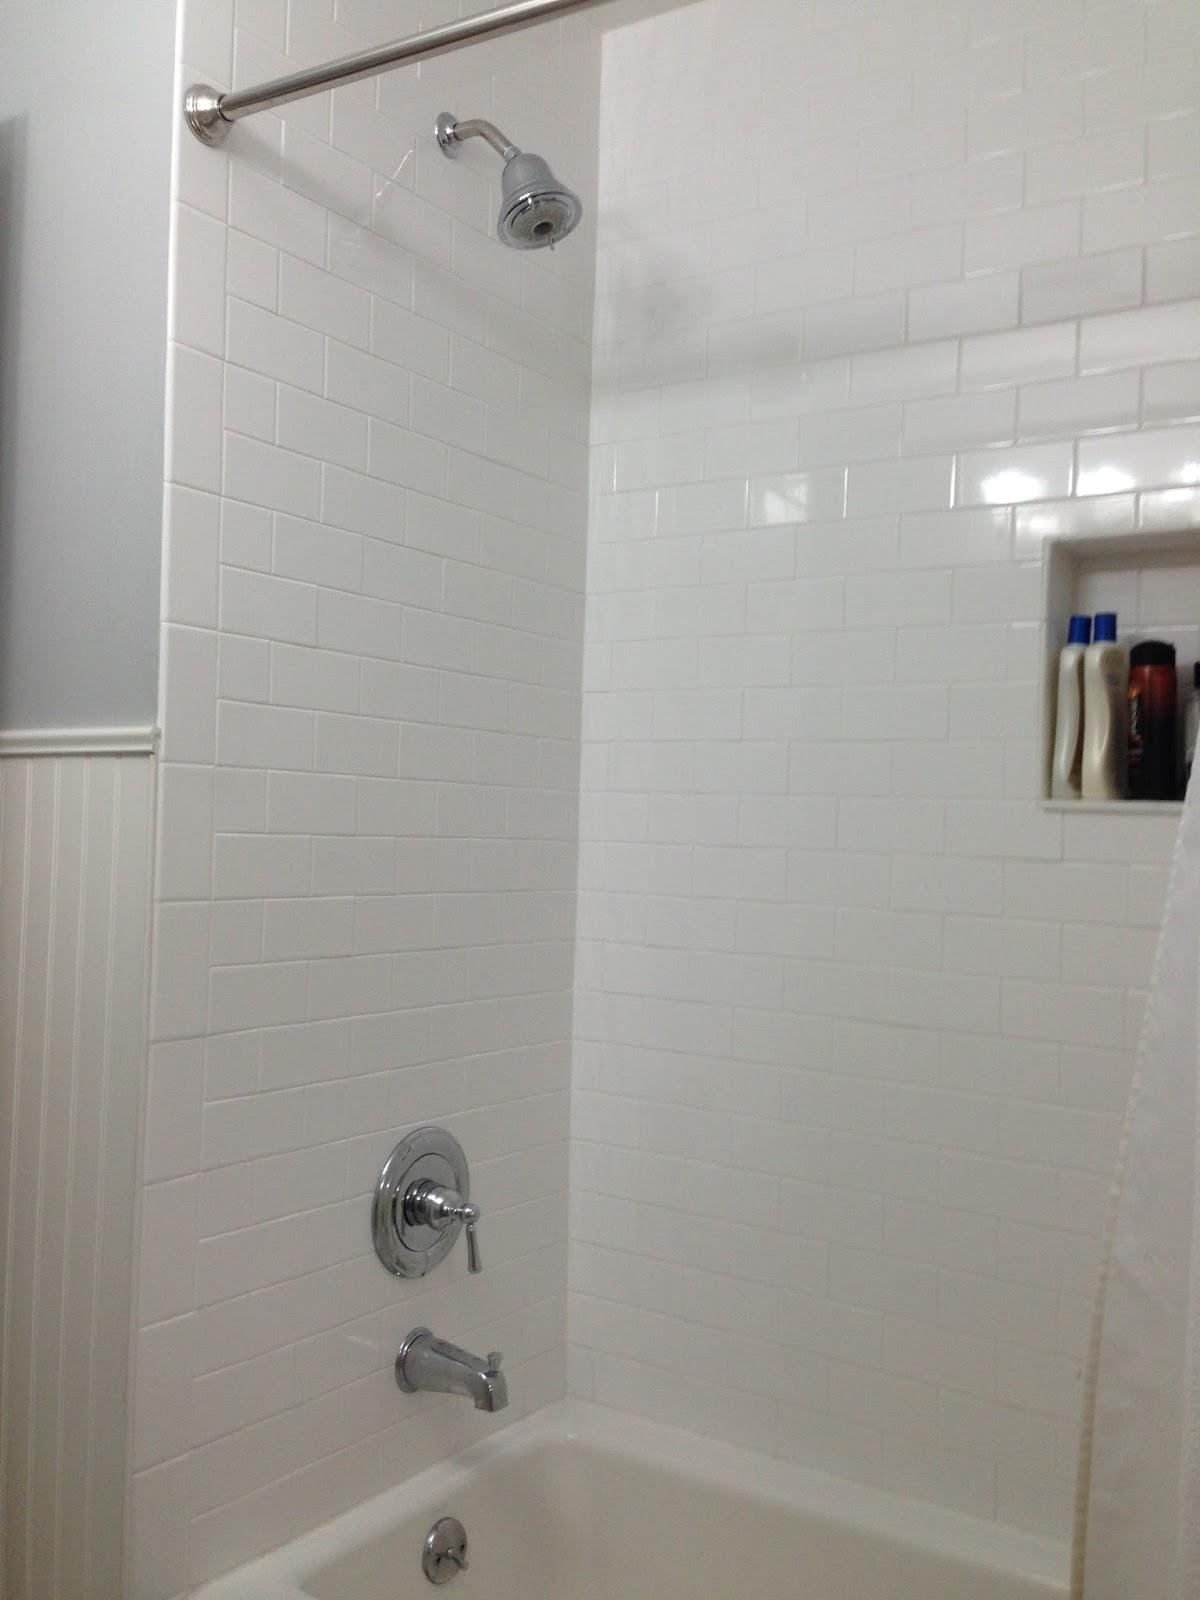 Minhus bathroom redo for Redoing bathroom walls